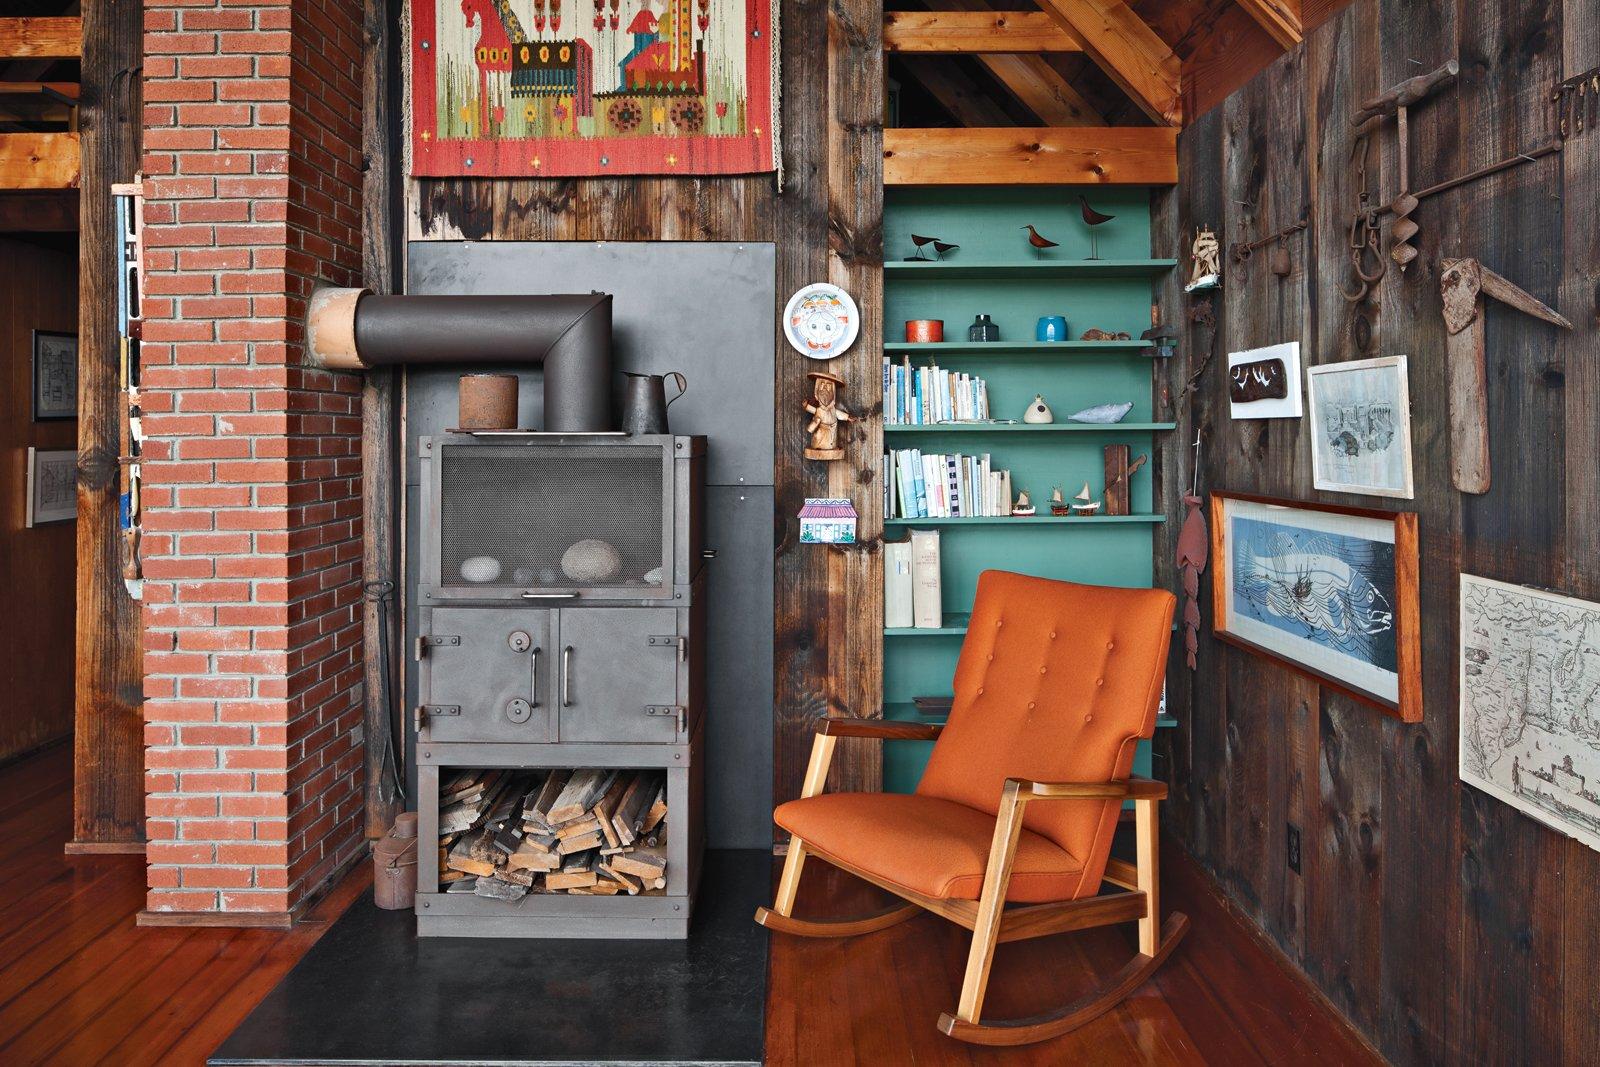 jens risom block island modern prefab vacation home a frame interior wood burning stove